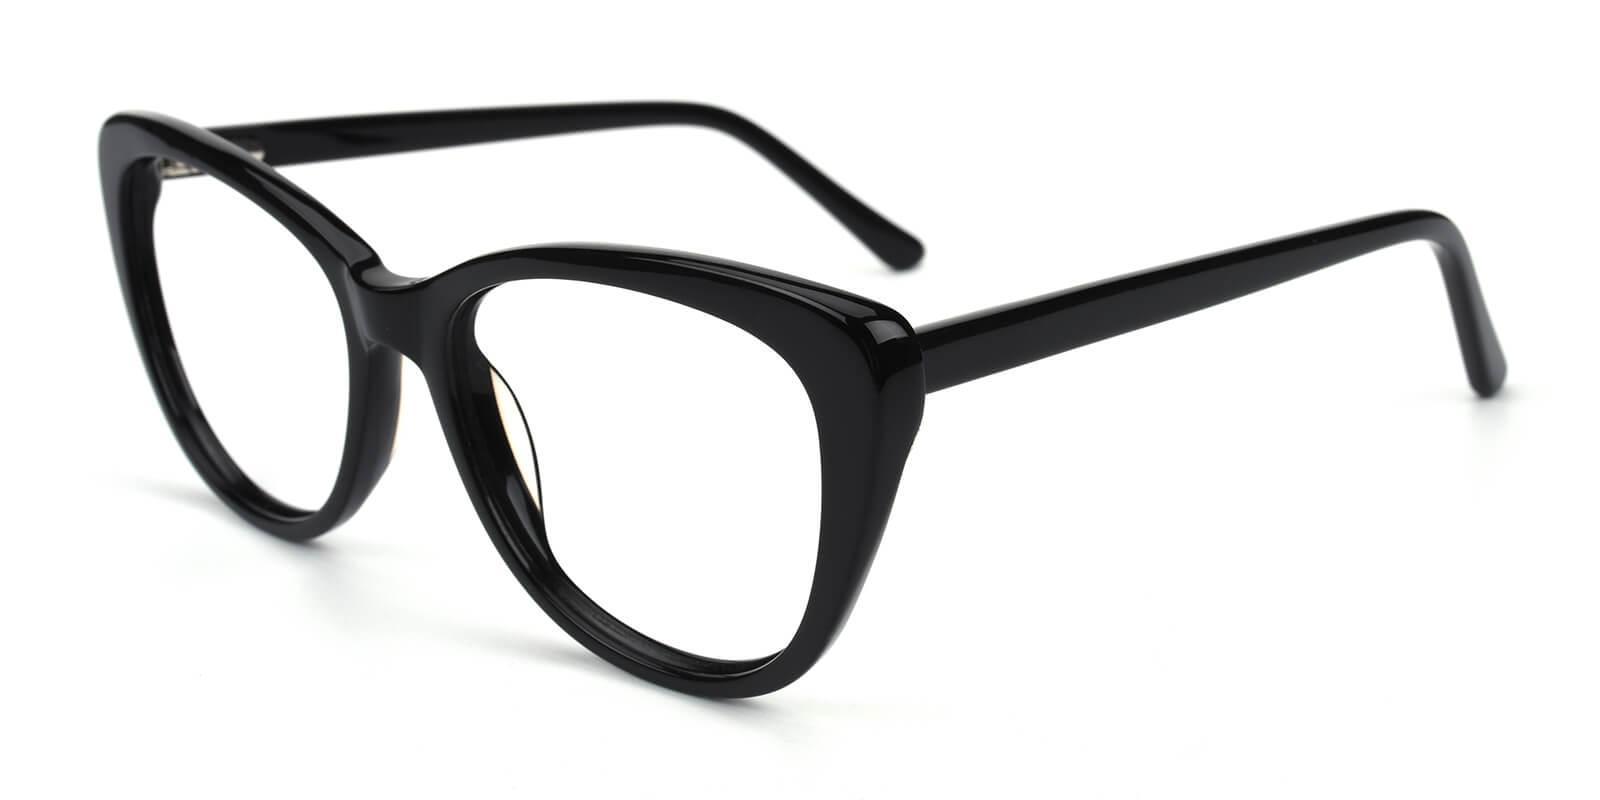 Secretly-Black-Cat-Acetate-Eyeglasses-additional1